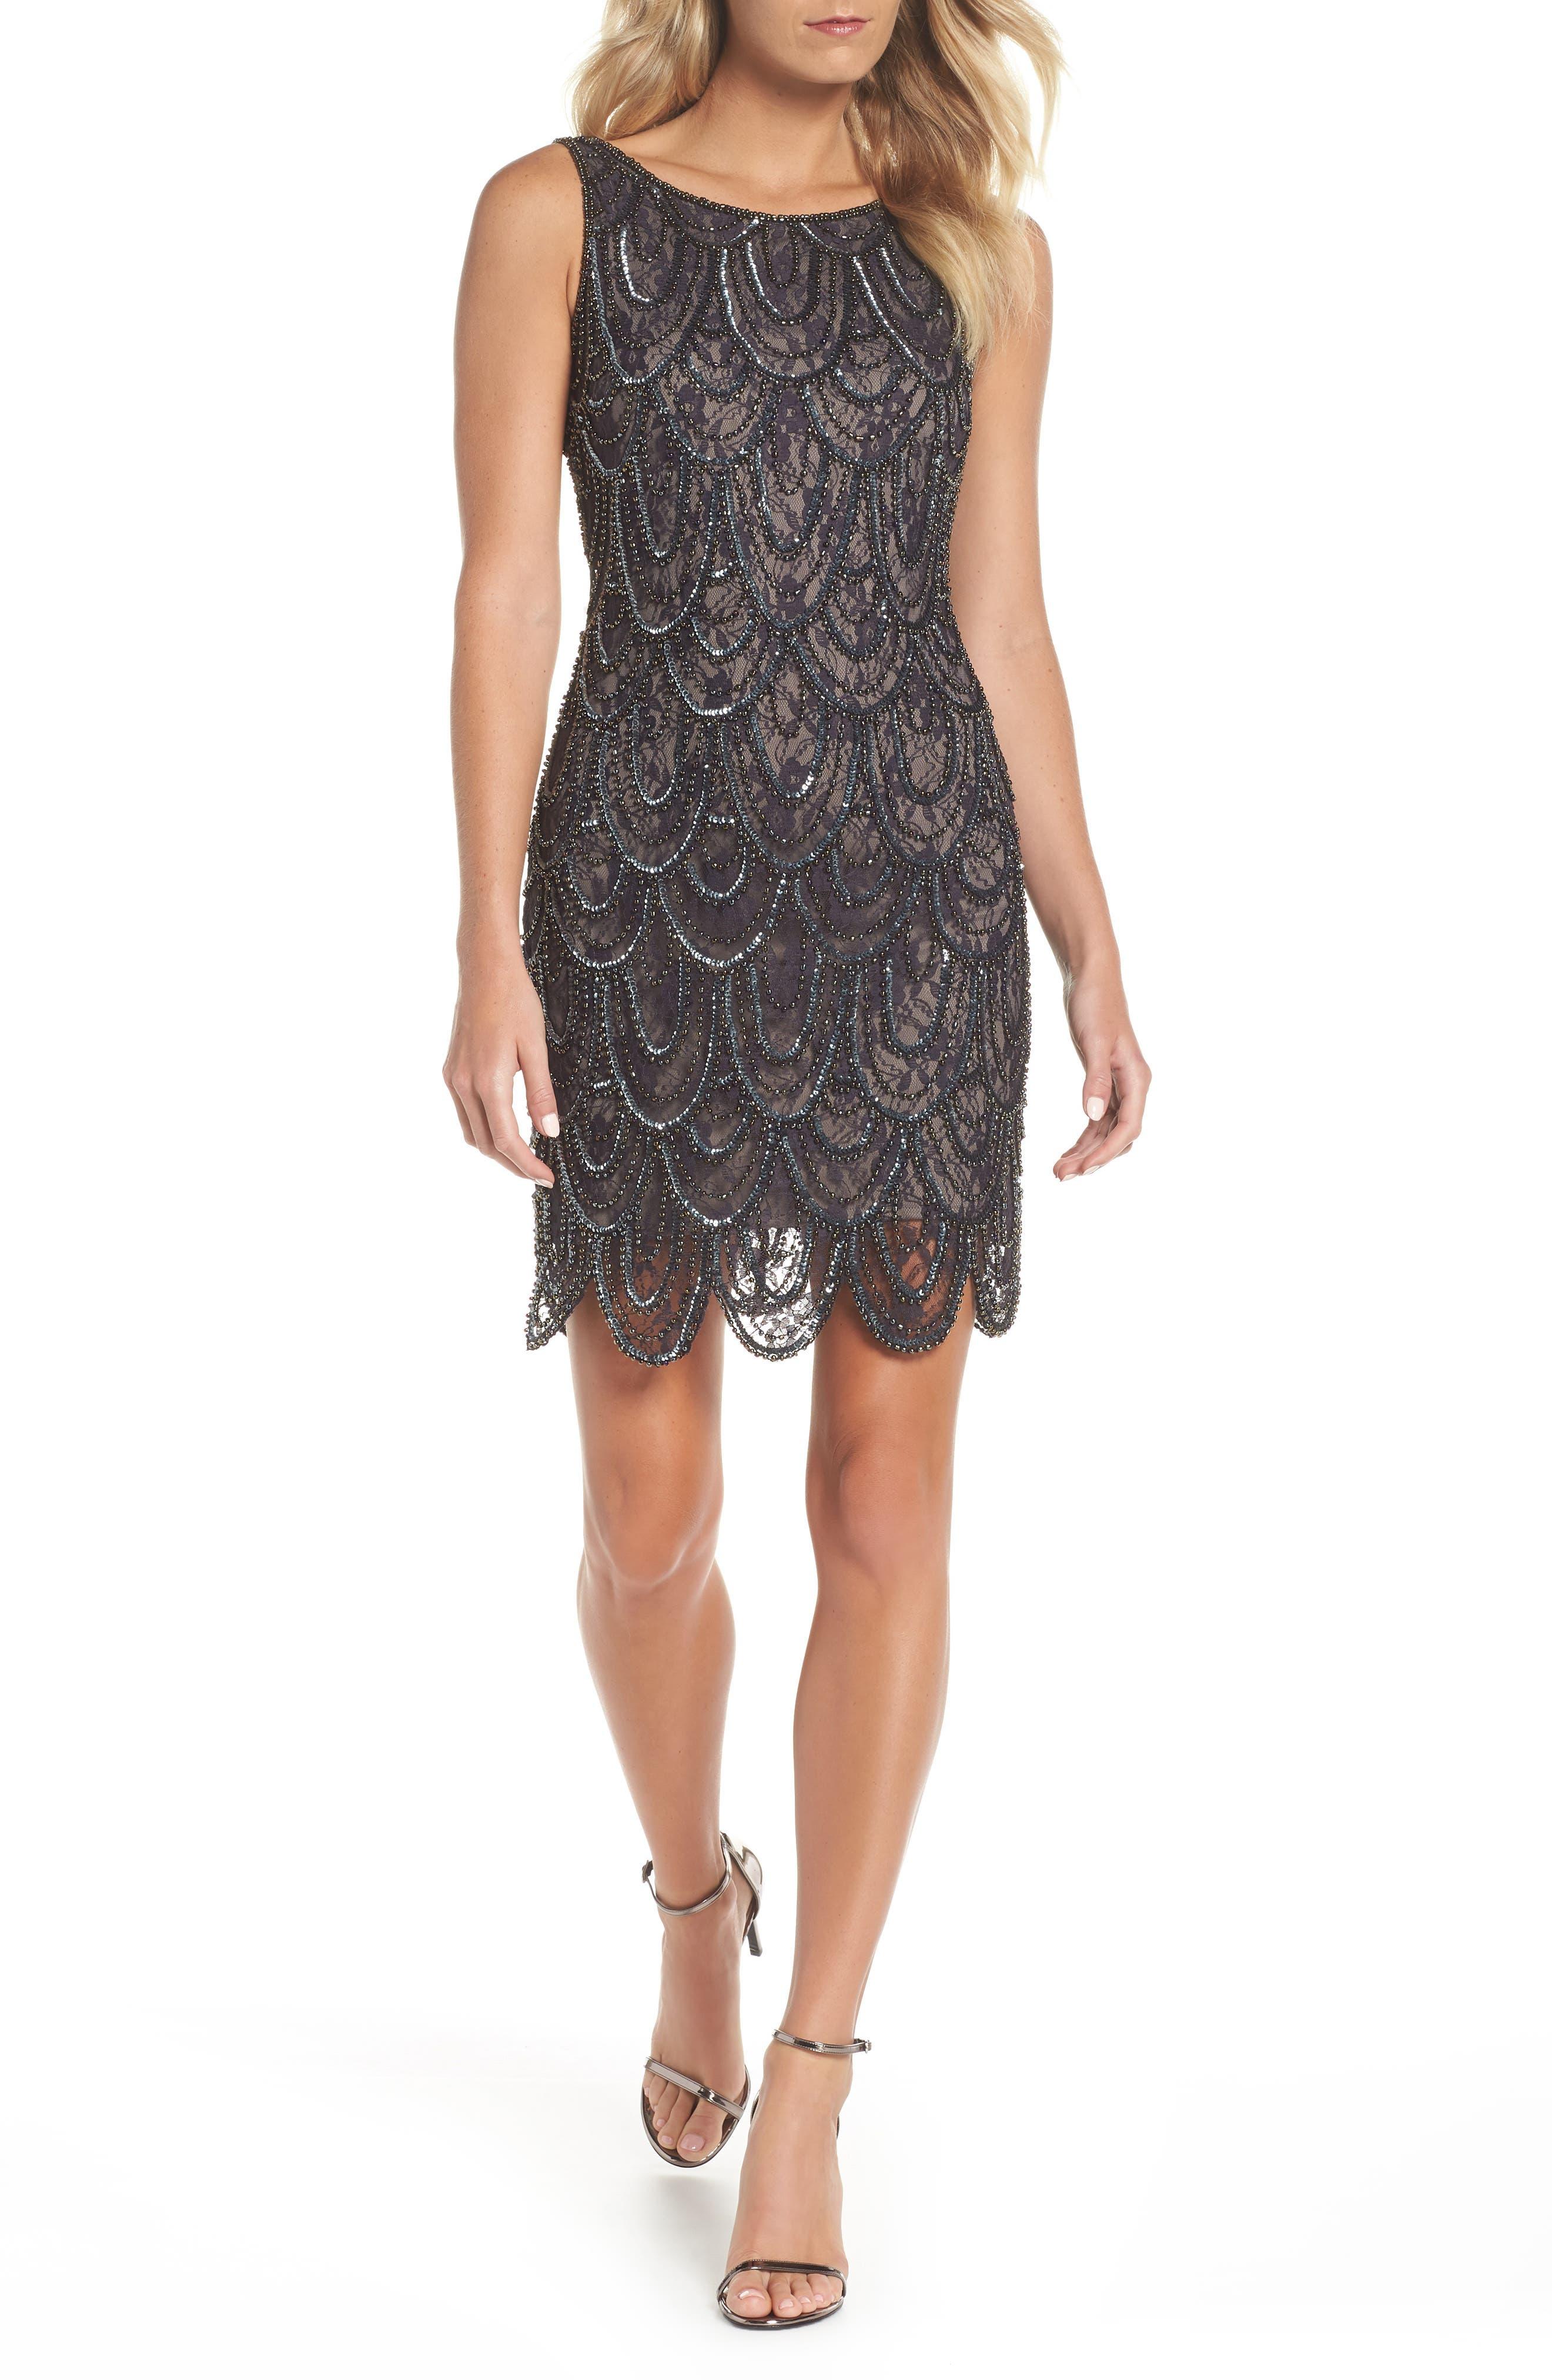 PISARRO NIGHTS Beaded Lace Sheath Dress, Main, color, 200